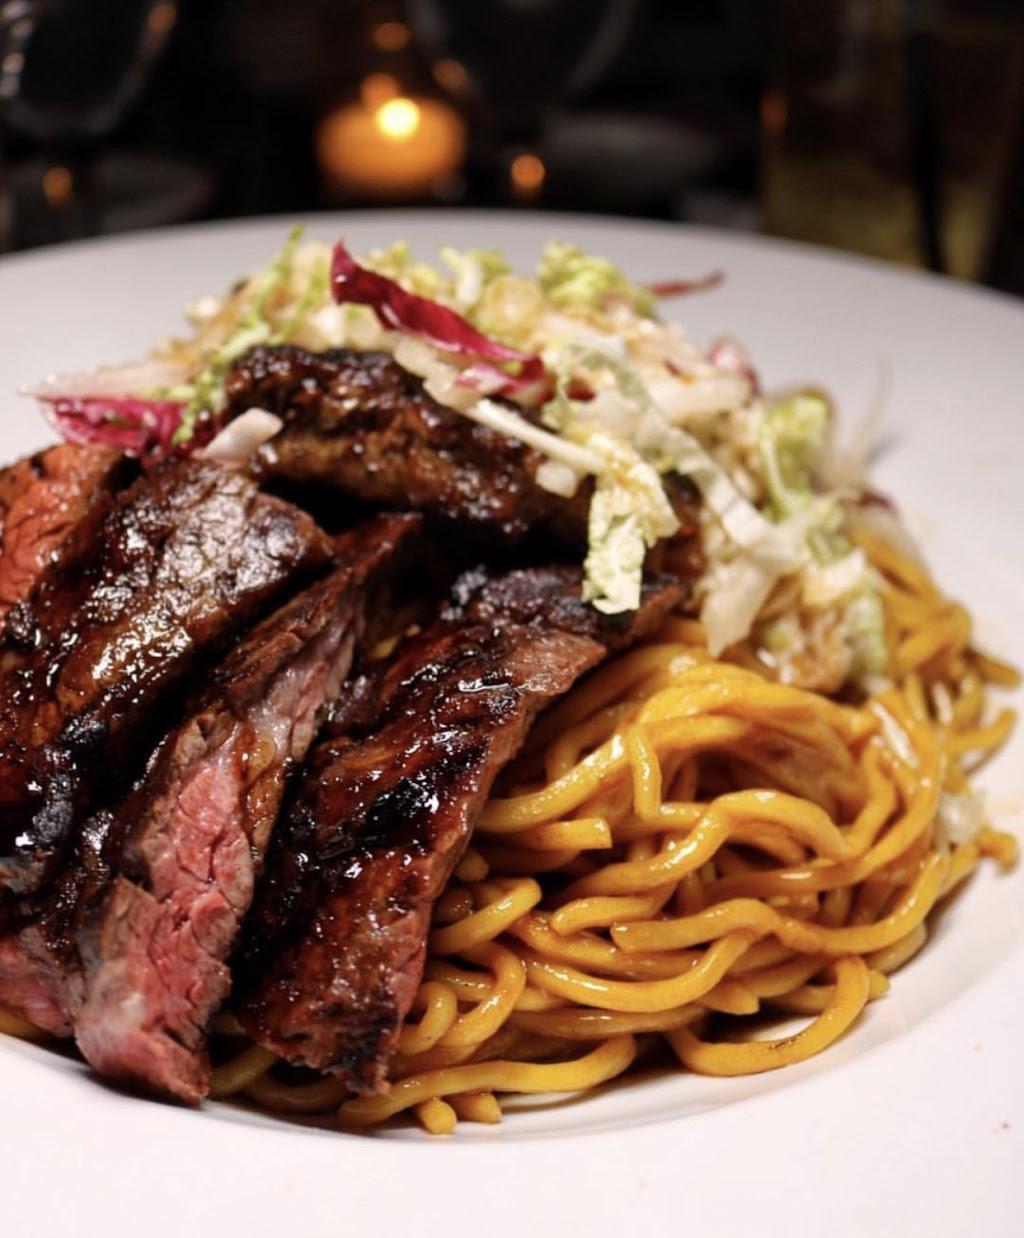 Red Lantern Foxwoods - restaurant  | Photo 9 of 10 | Address: 240 Fox Tower Dr, Mashantucket, CT 06338, USA | Phone: (860) 312-8480